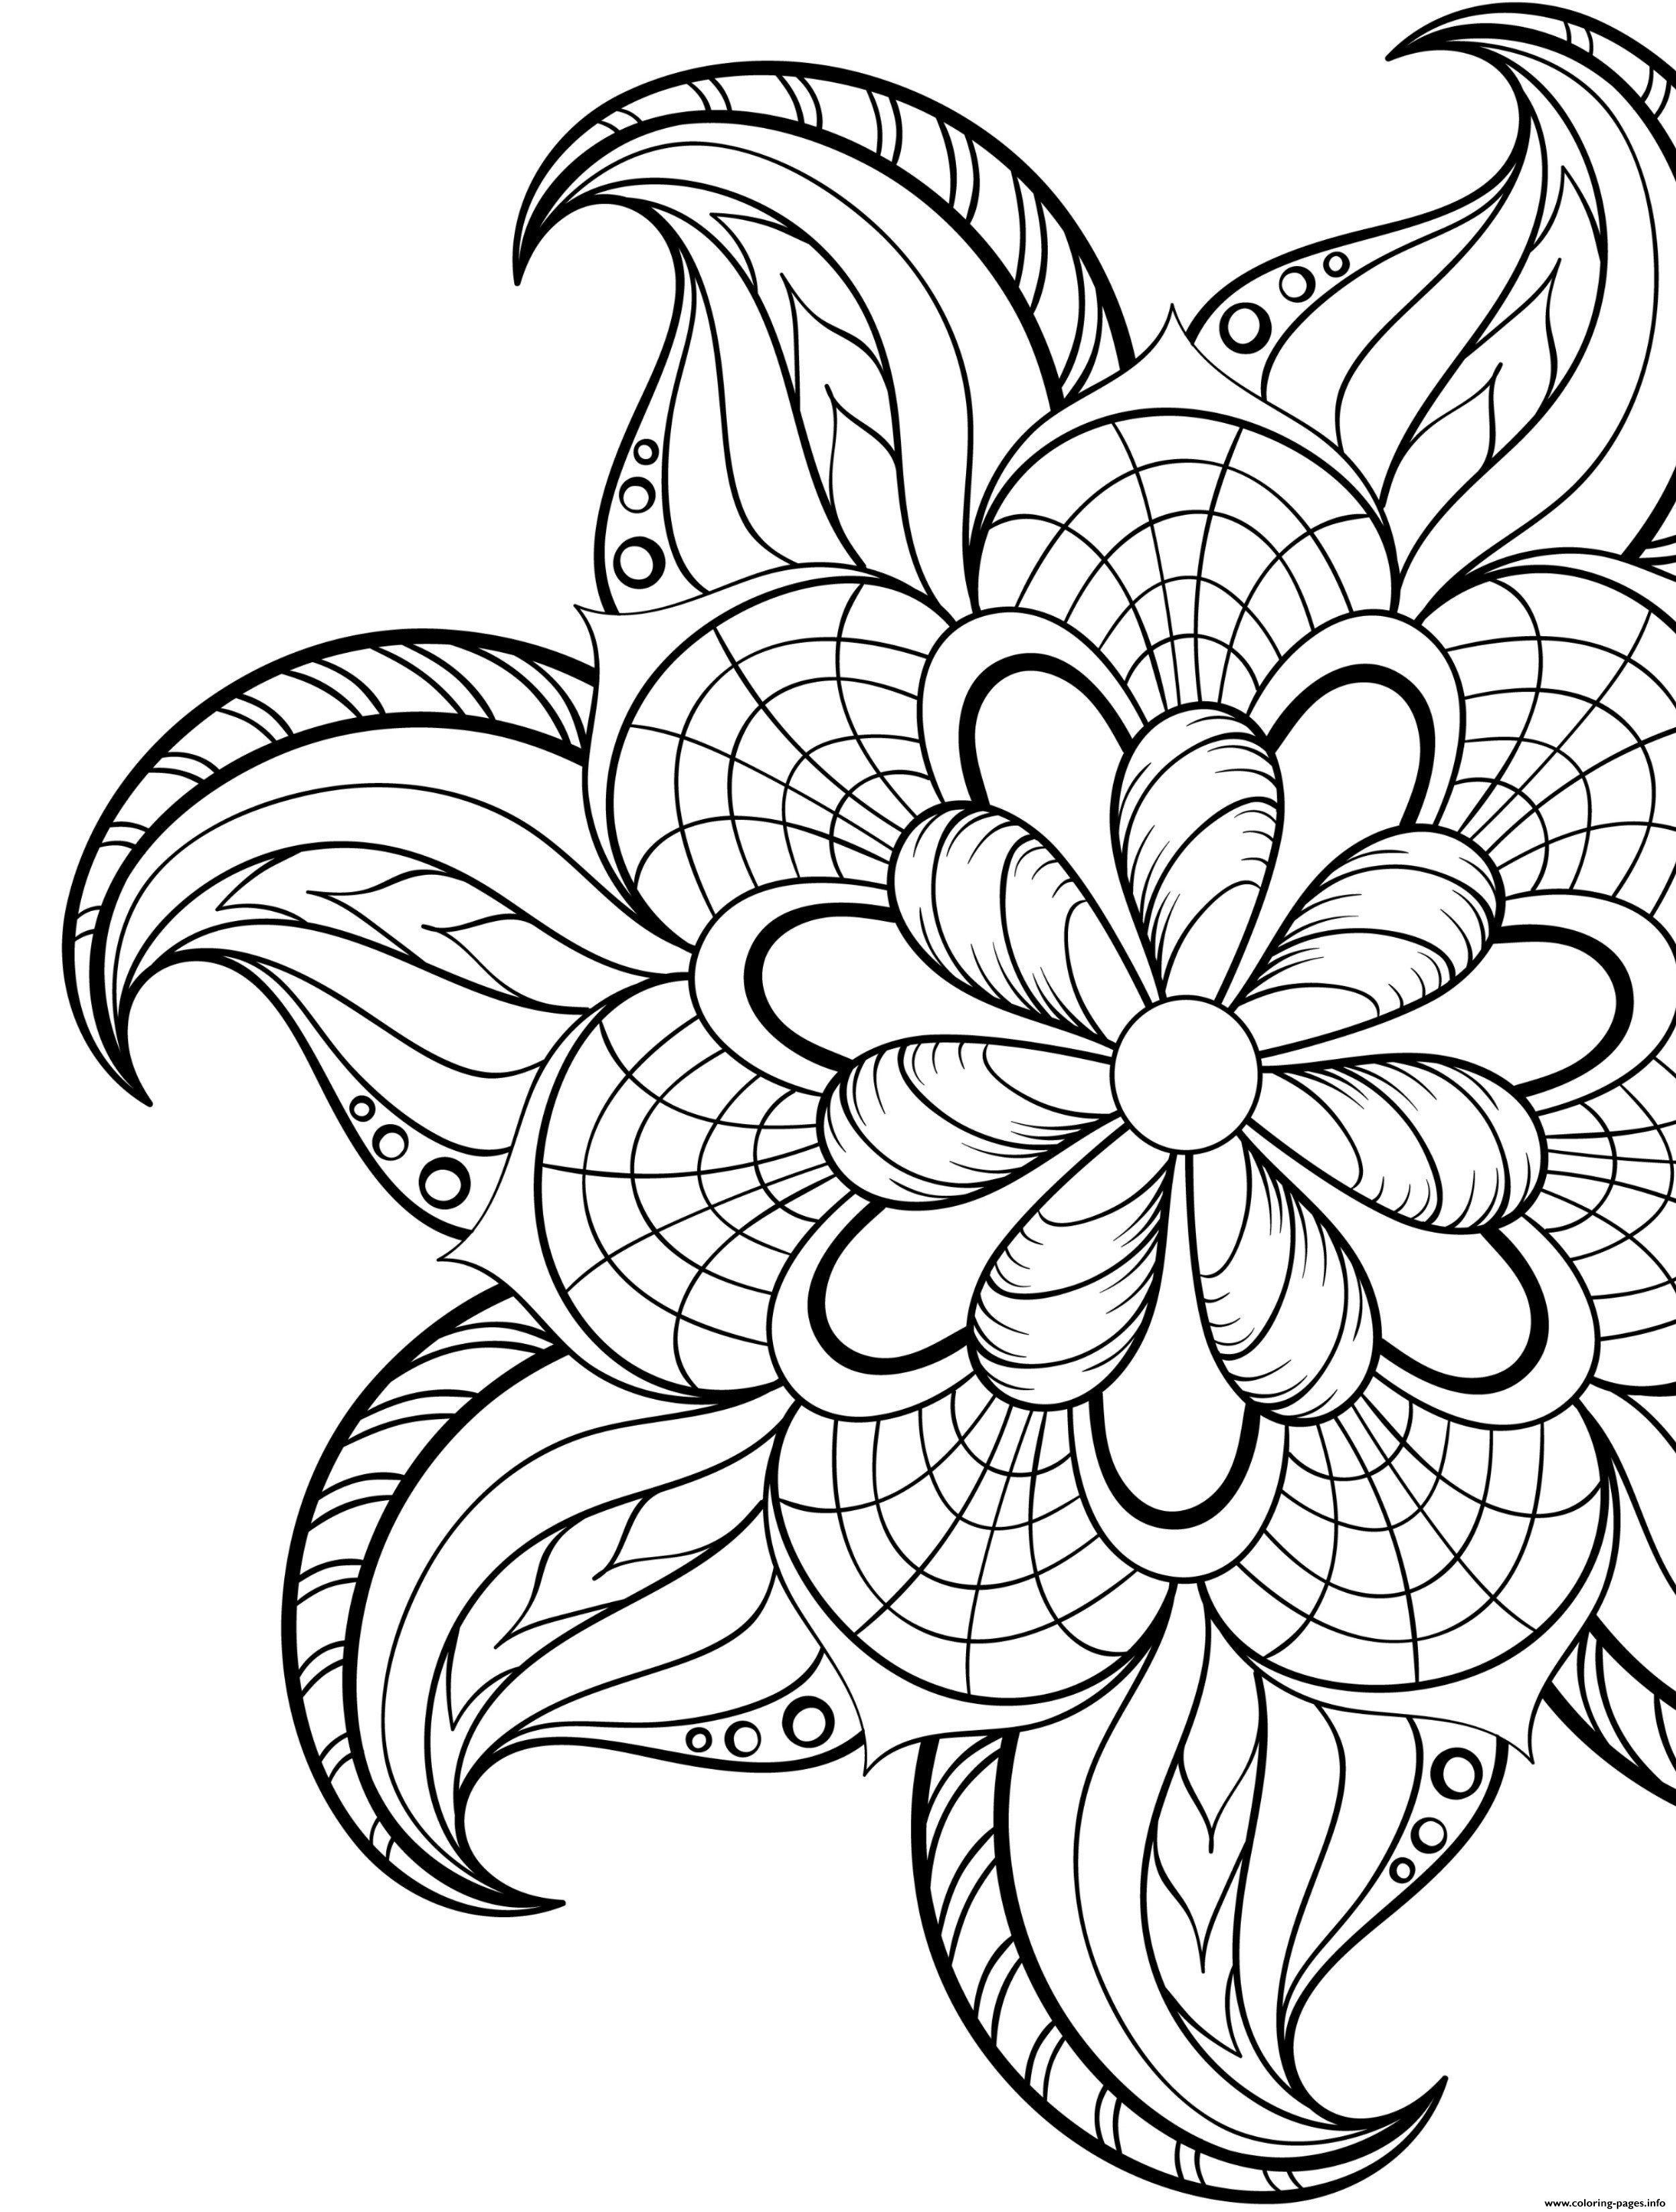 Mandala Flowers Spring Coloring Pages Printable